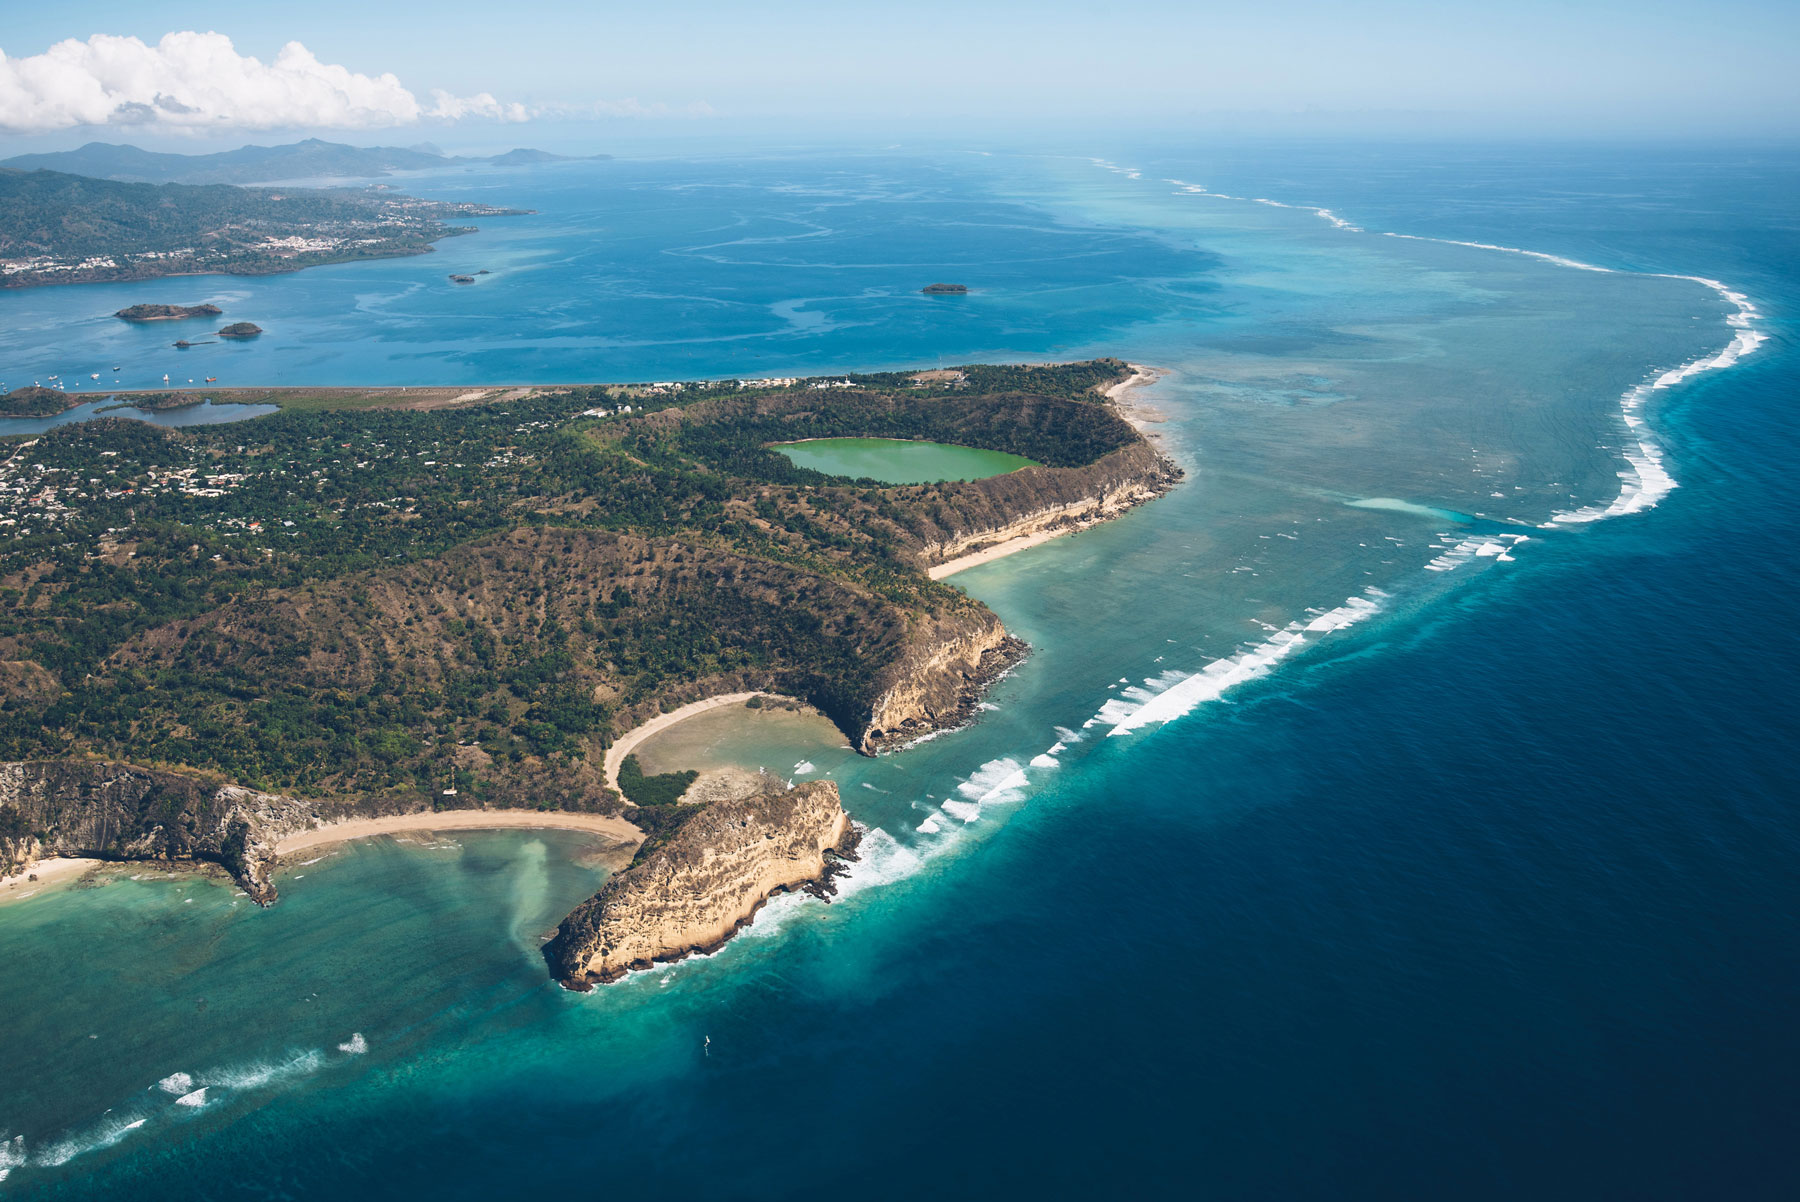 Lac Dziani depuis les airs, ULM TipTop Mayotte